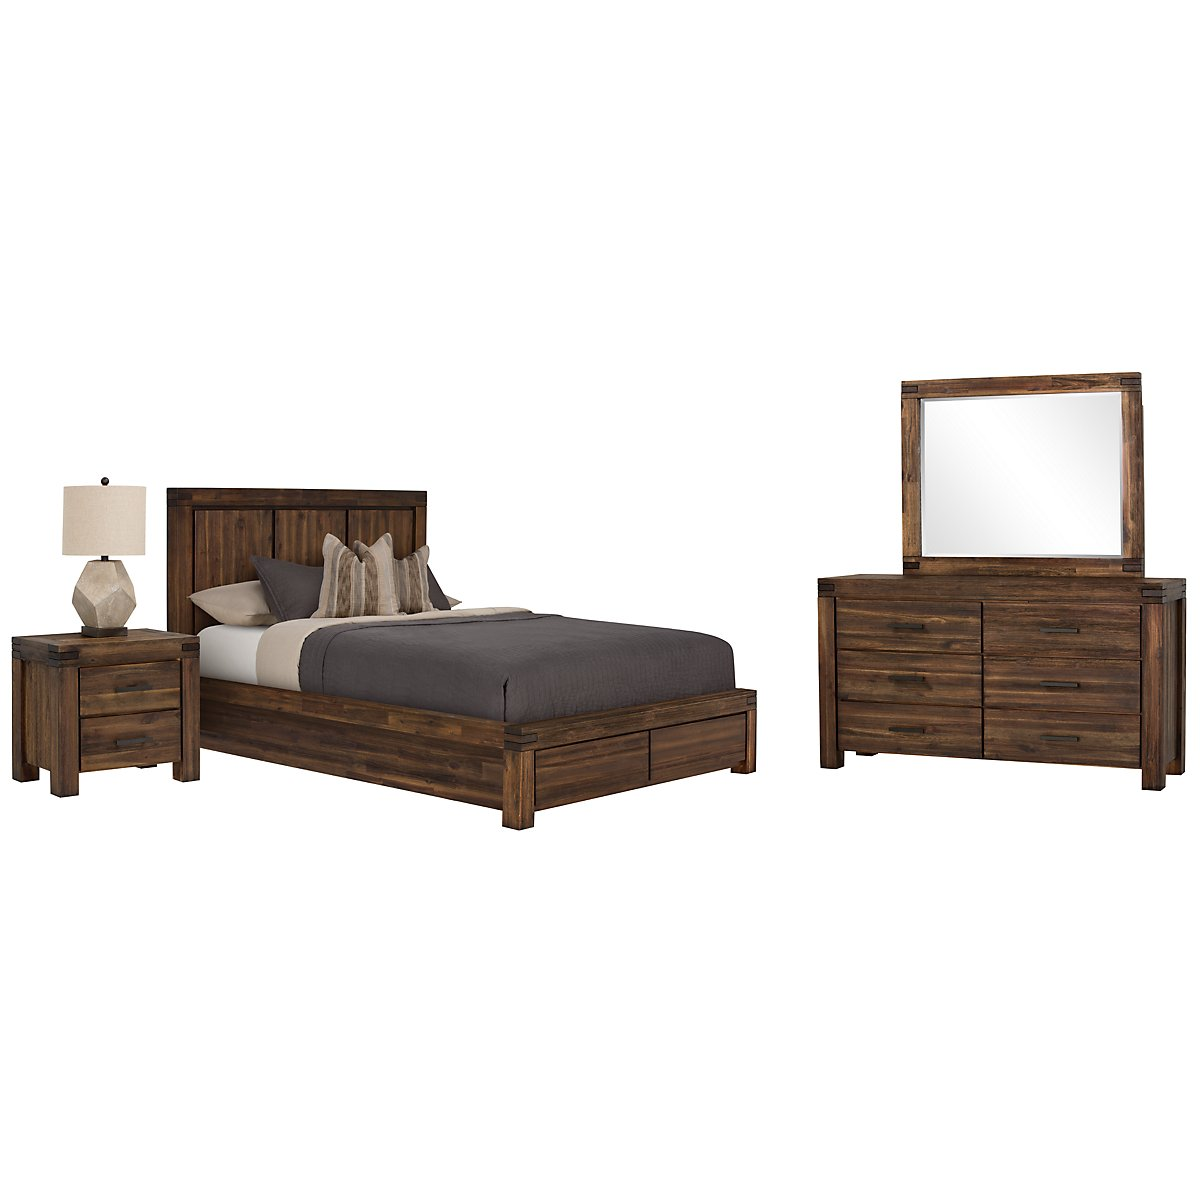 Holden Mid Tone Wood Platform Storage Bedroom